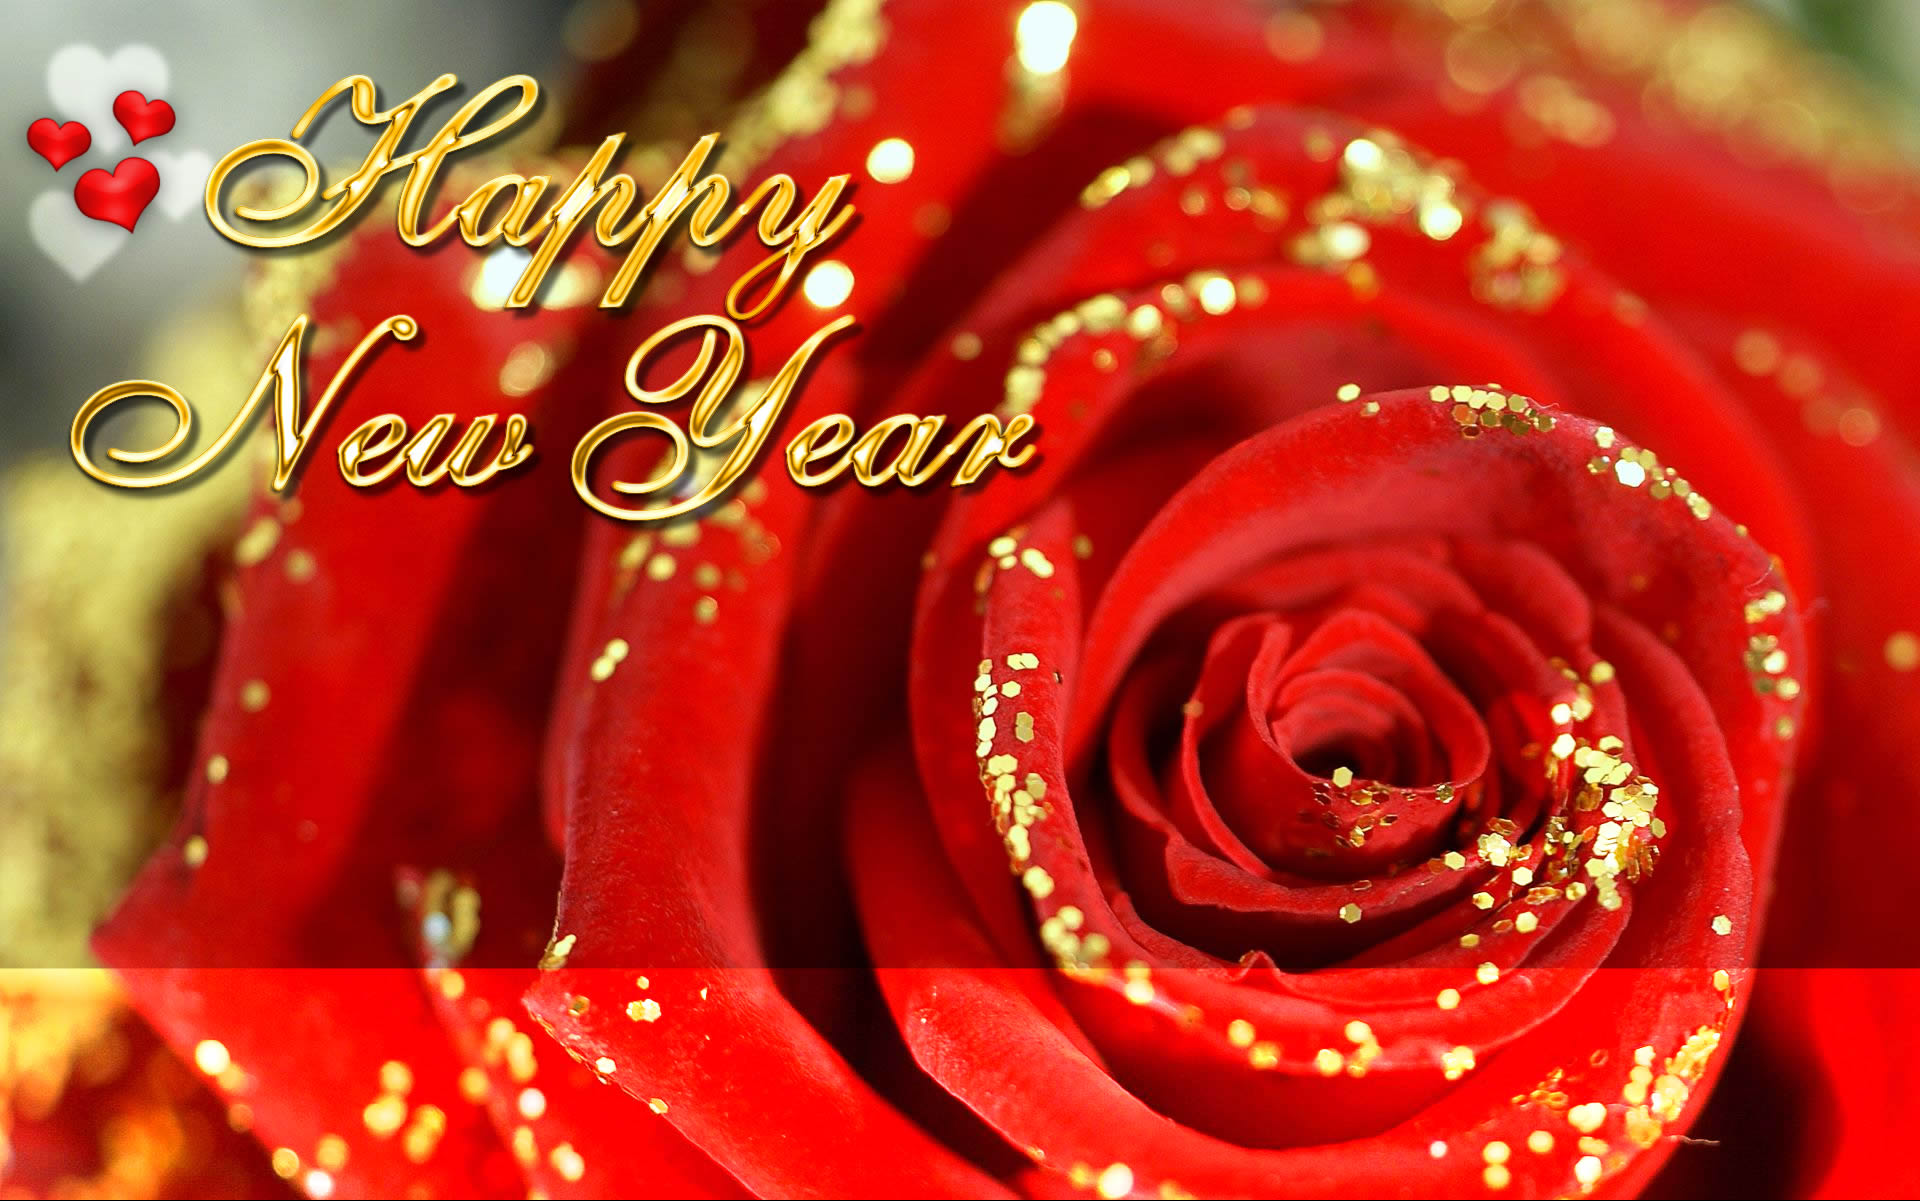 http://www.fabiovisentin.com//photography/photo/16/happy-new-year-4-rose.jpg